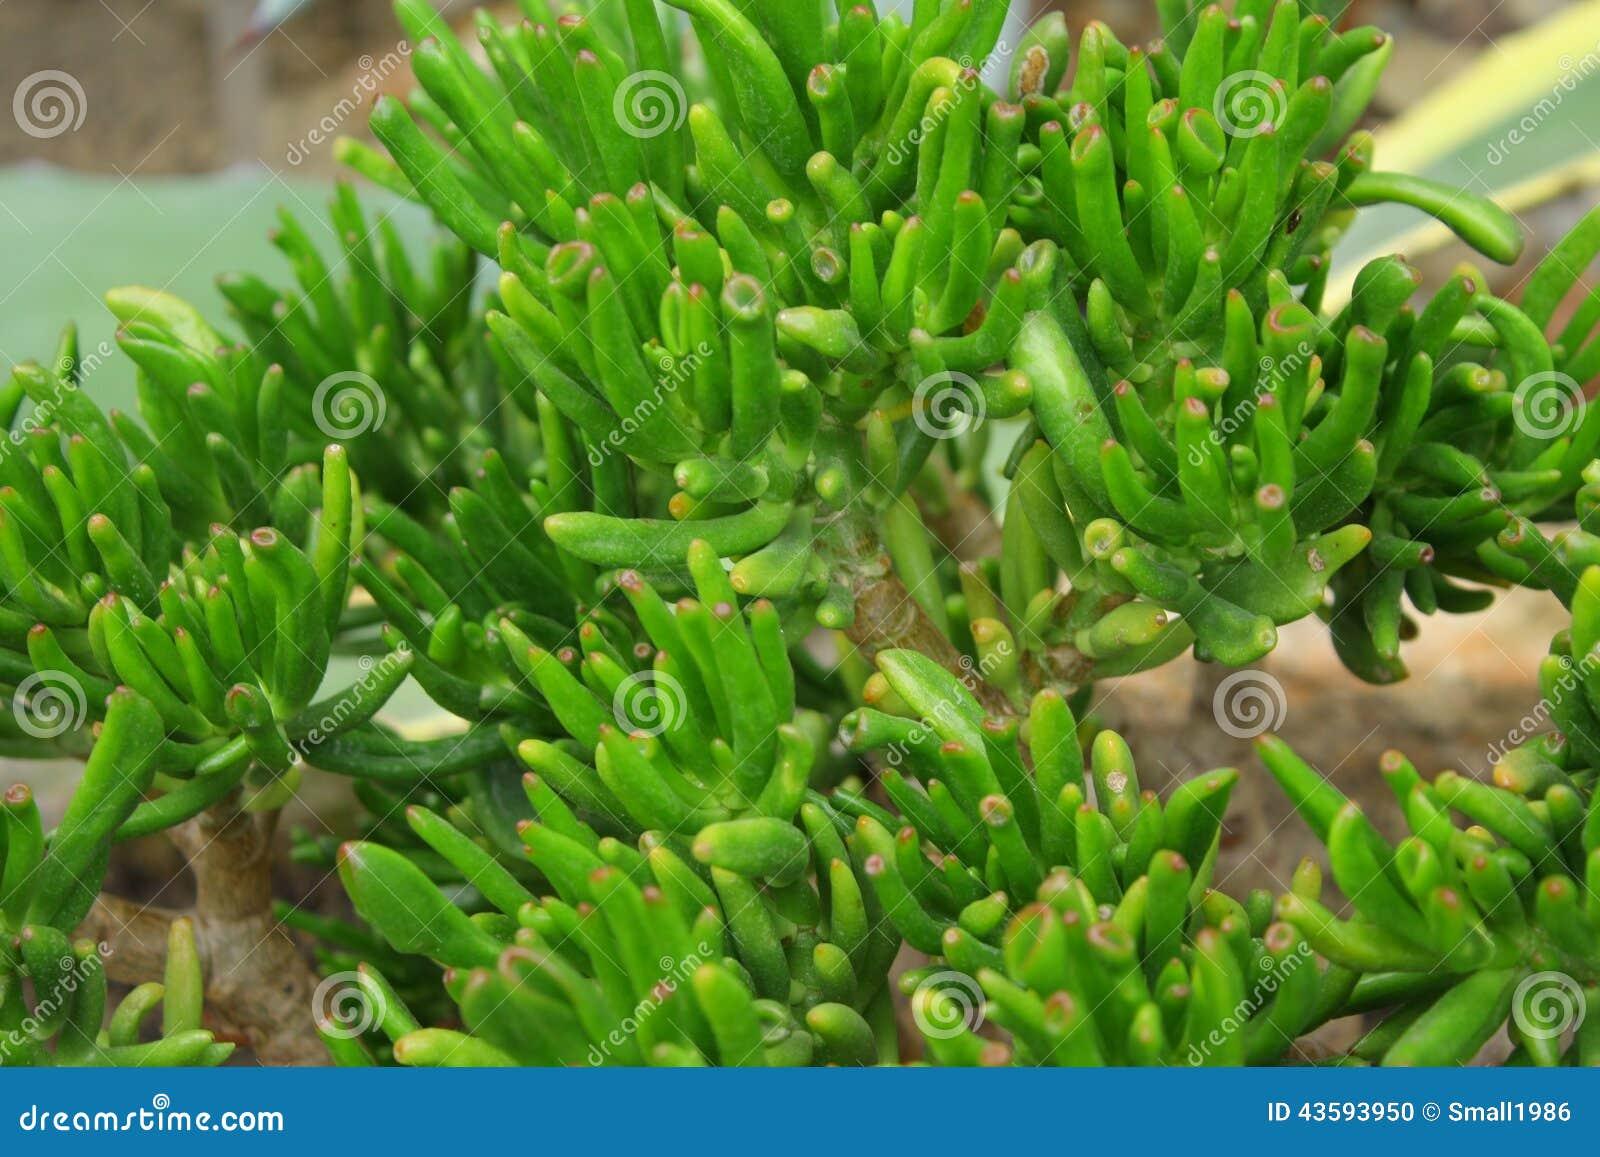 plante verte exotique photo stock image du exotique 43593950. Black Bedroom Furniture Sets. Home Design Ideas